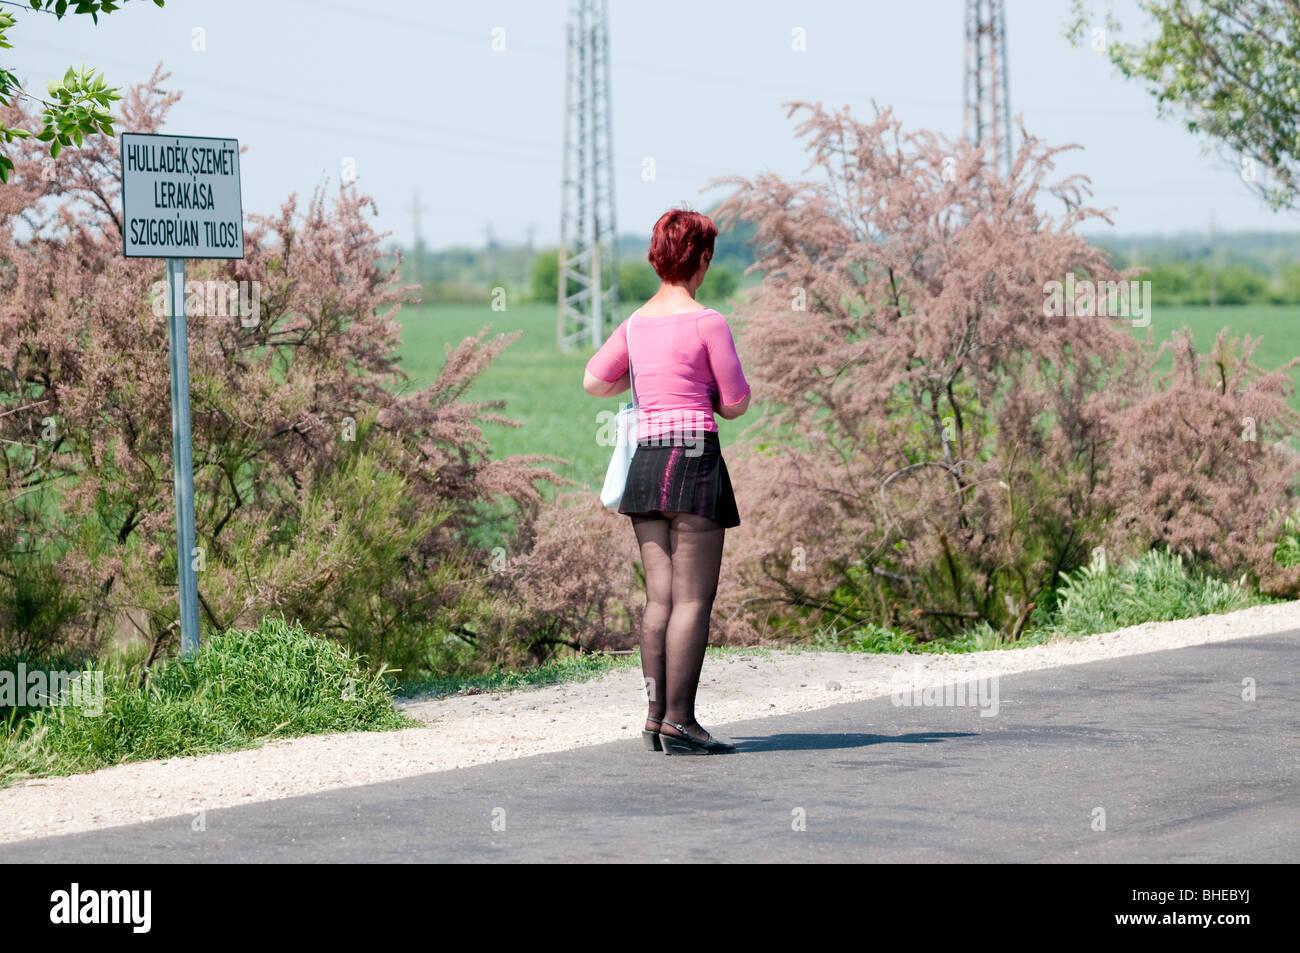 budapest prostituutio video free